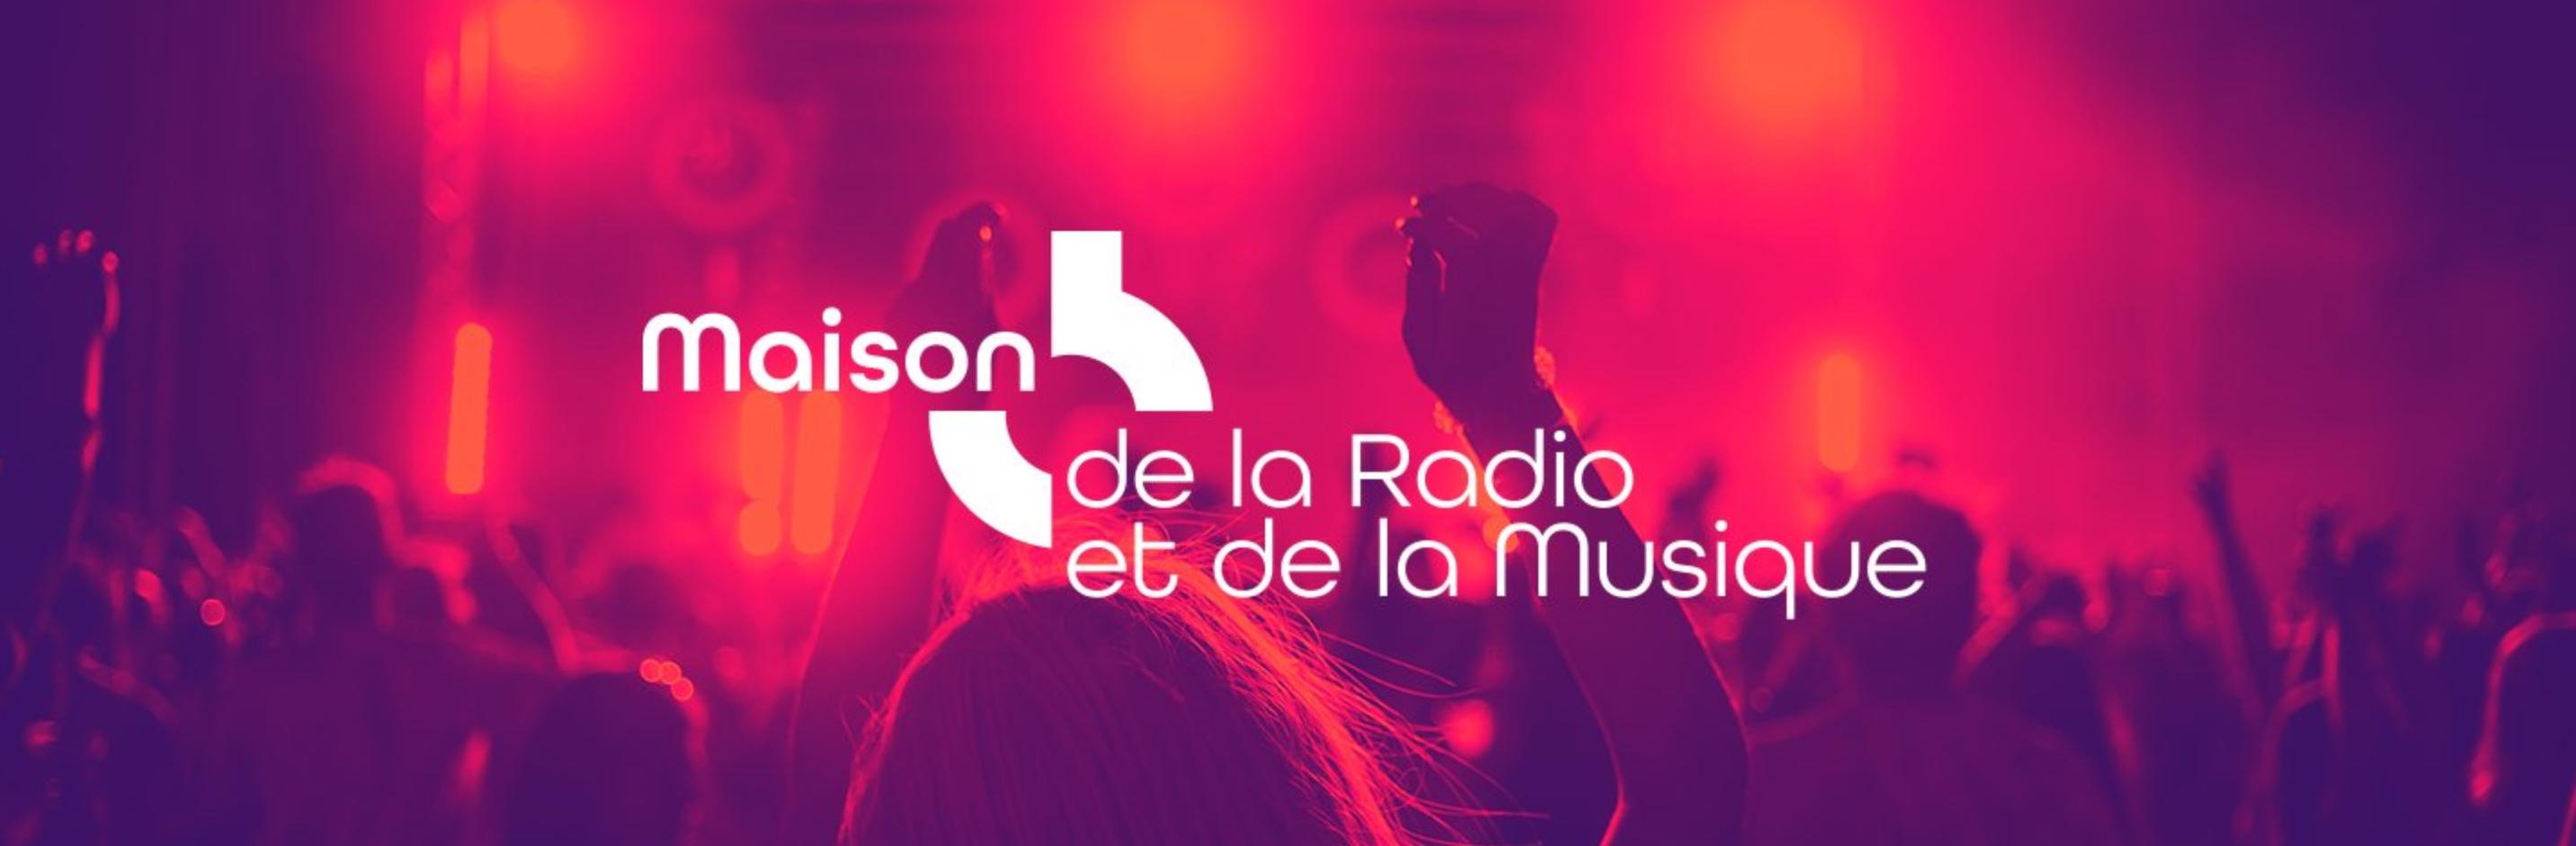 Radio France se rebaptise « Maison de la radio et de la musique »